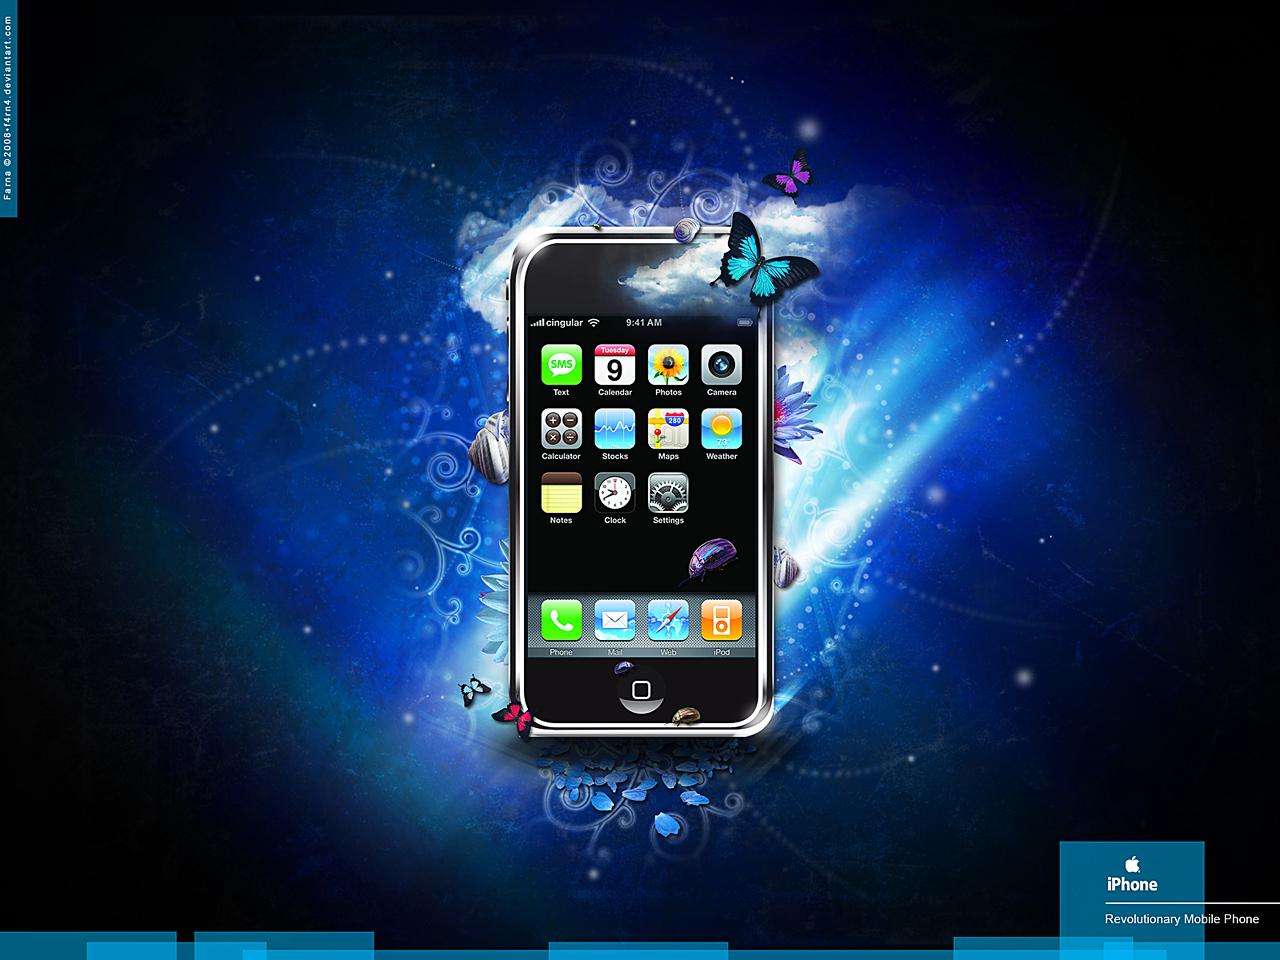 tags iphone iphone wallpaper iphone desktop wallpaper cool iphone 1280x960